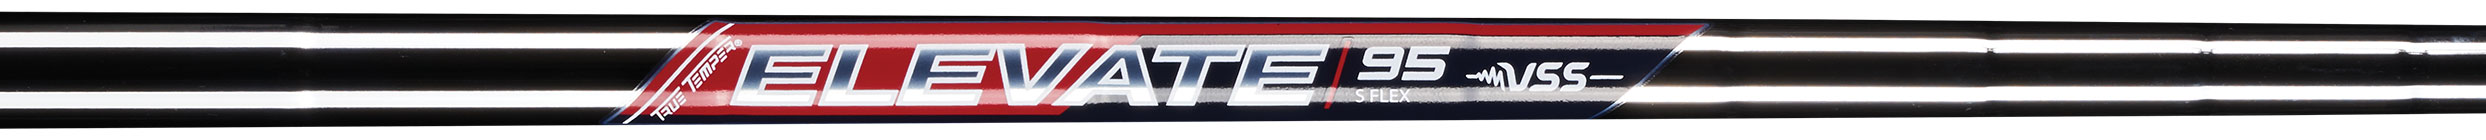 irons-2019-mavrik-steel-shaft-TRUE-TEMPER-ELEVATE-95-STEEL